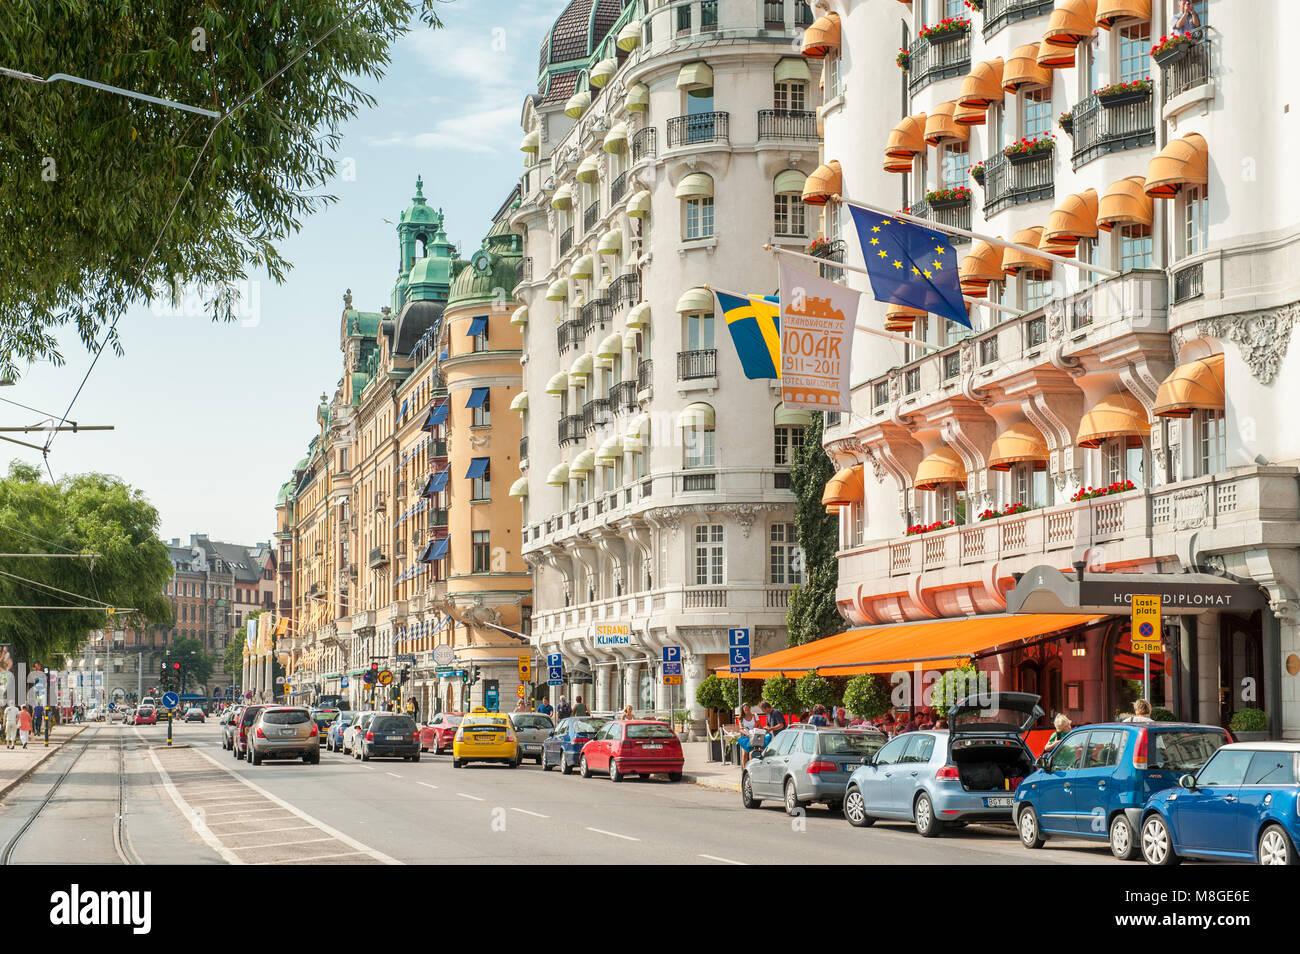 Una strada elegante strandvägen a stoccolma alcuni dei più